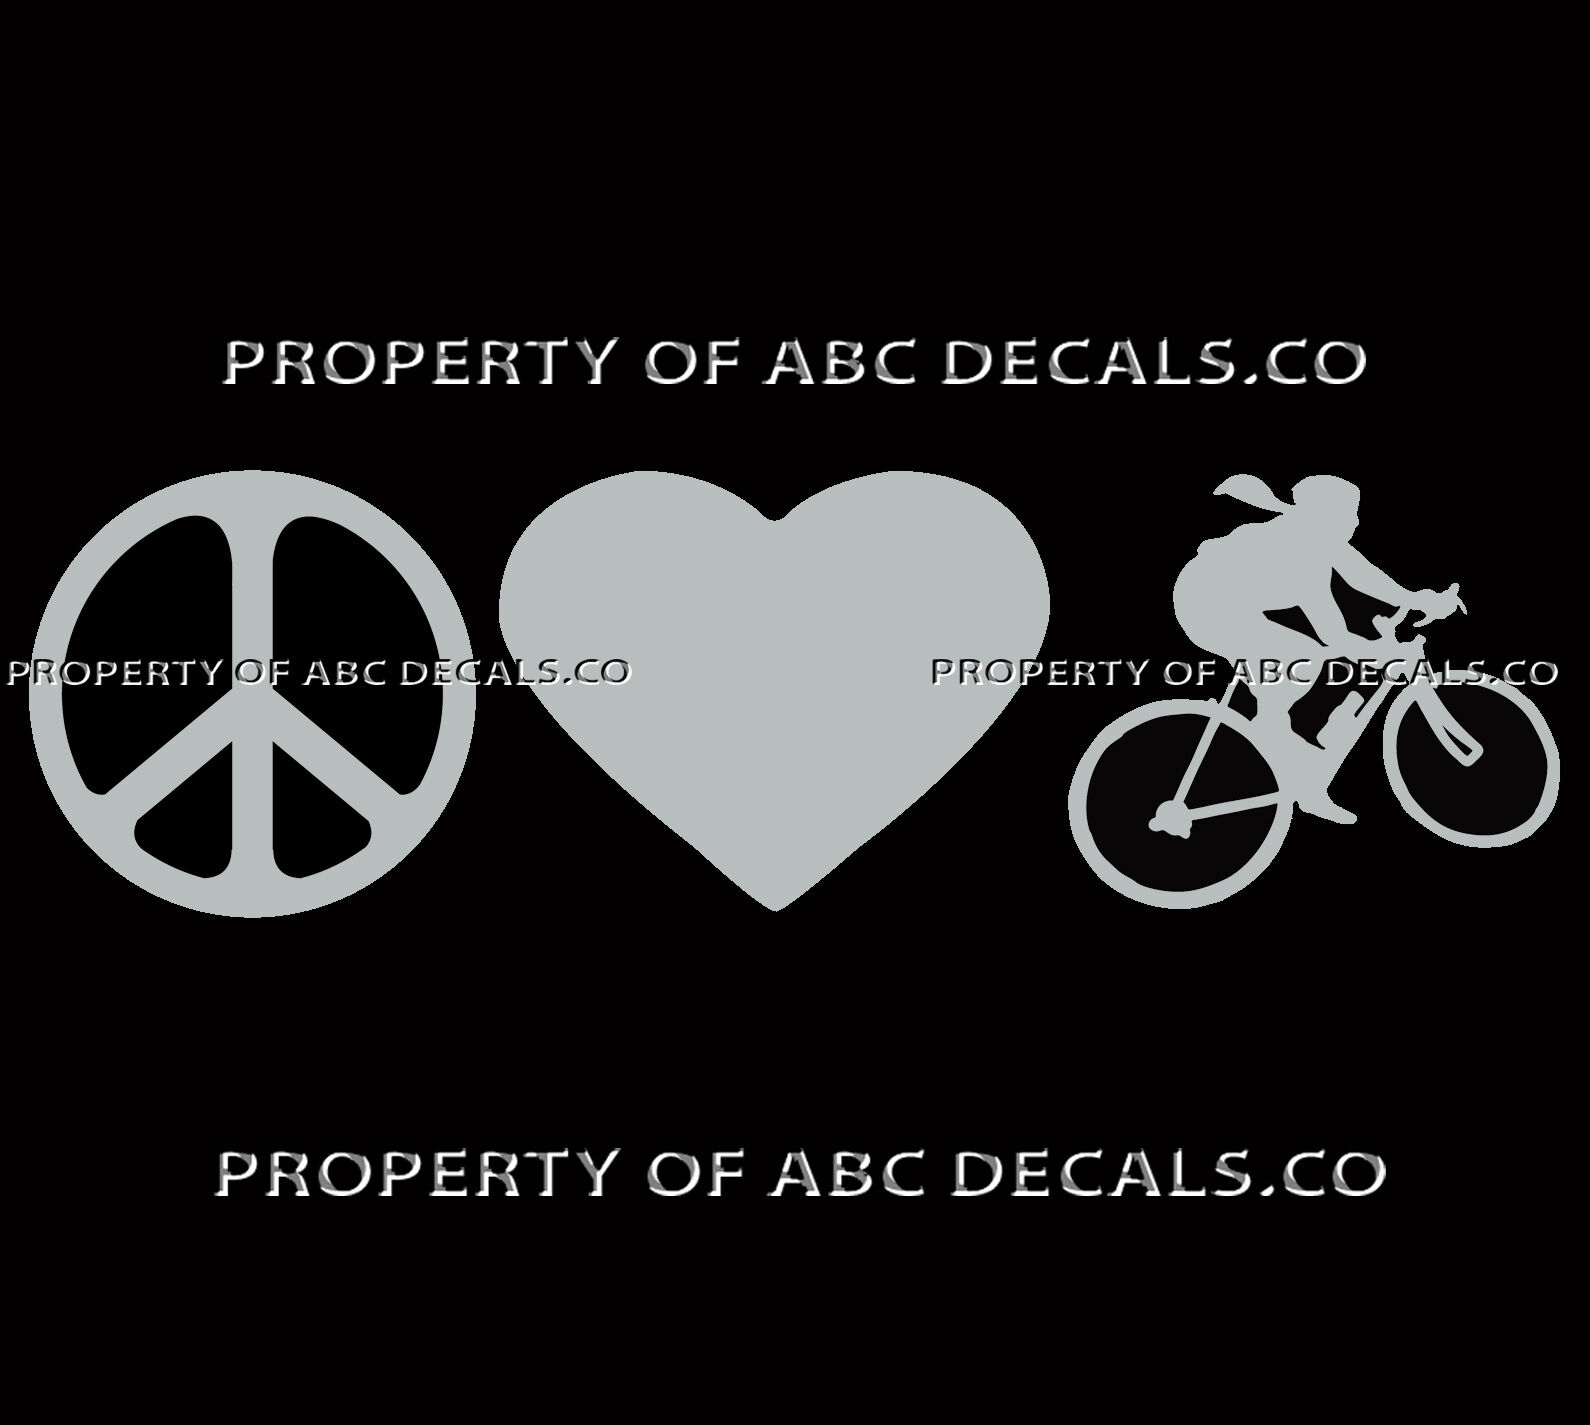 EAT SLEEP RIDE Street Cycling Vinyl Decal Sticker Cycle Bike Bumper Car Sign